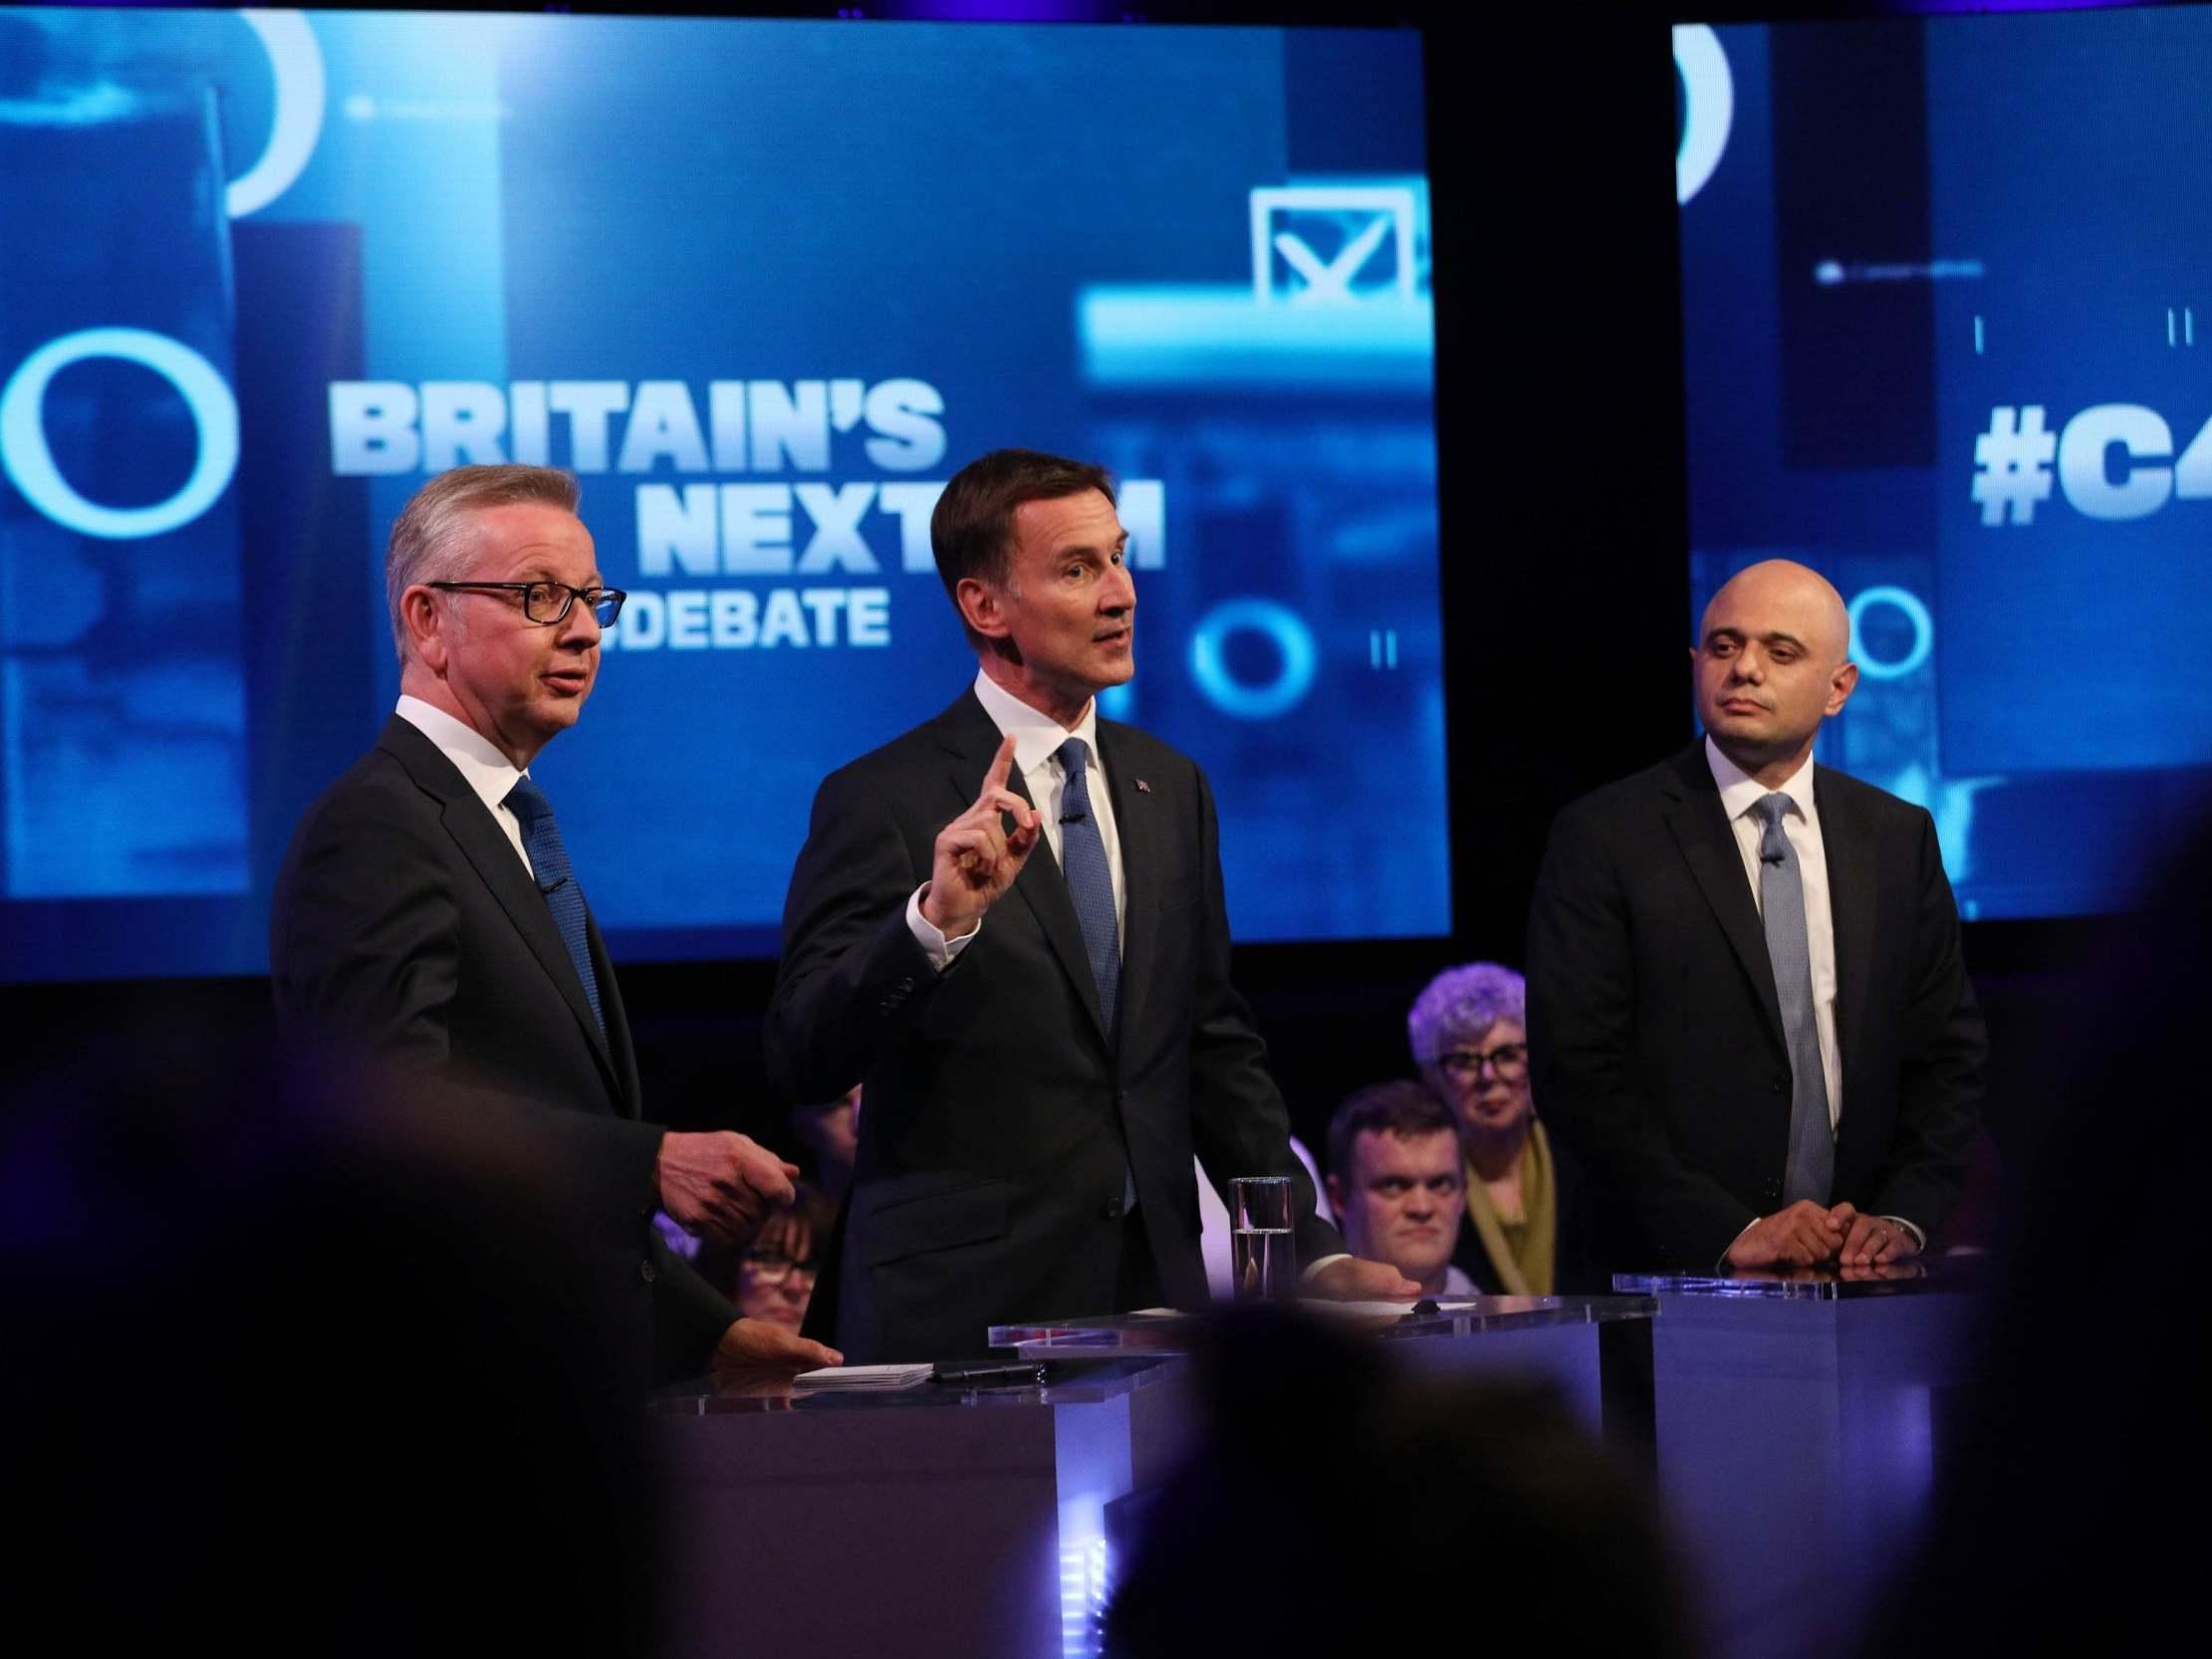 Tory leadership debate: Jeremy Hunt attacks Boris Johnson for skipping TV hustings